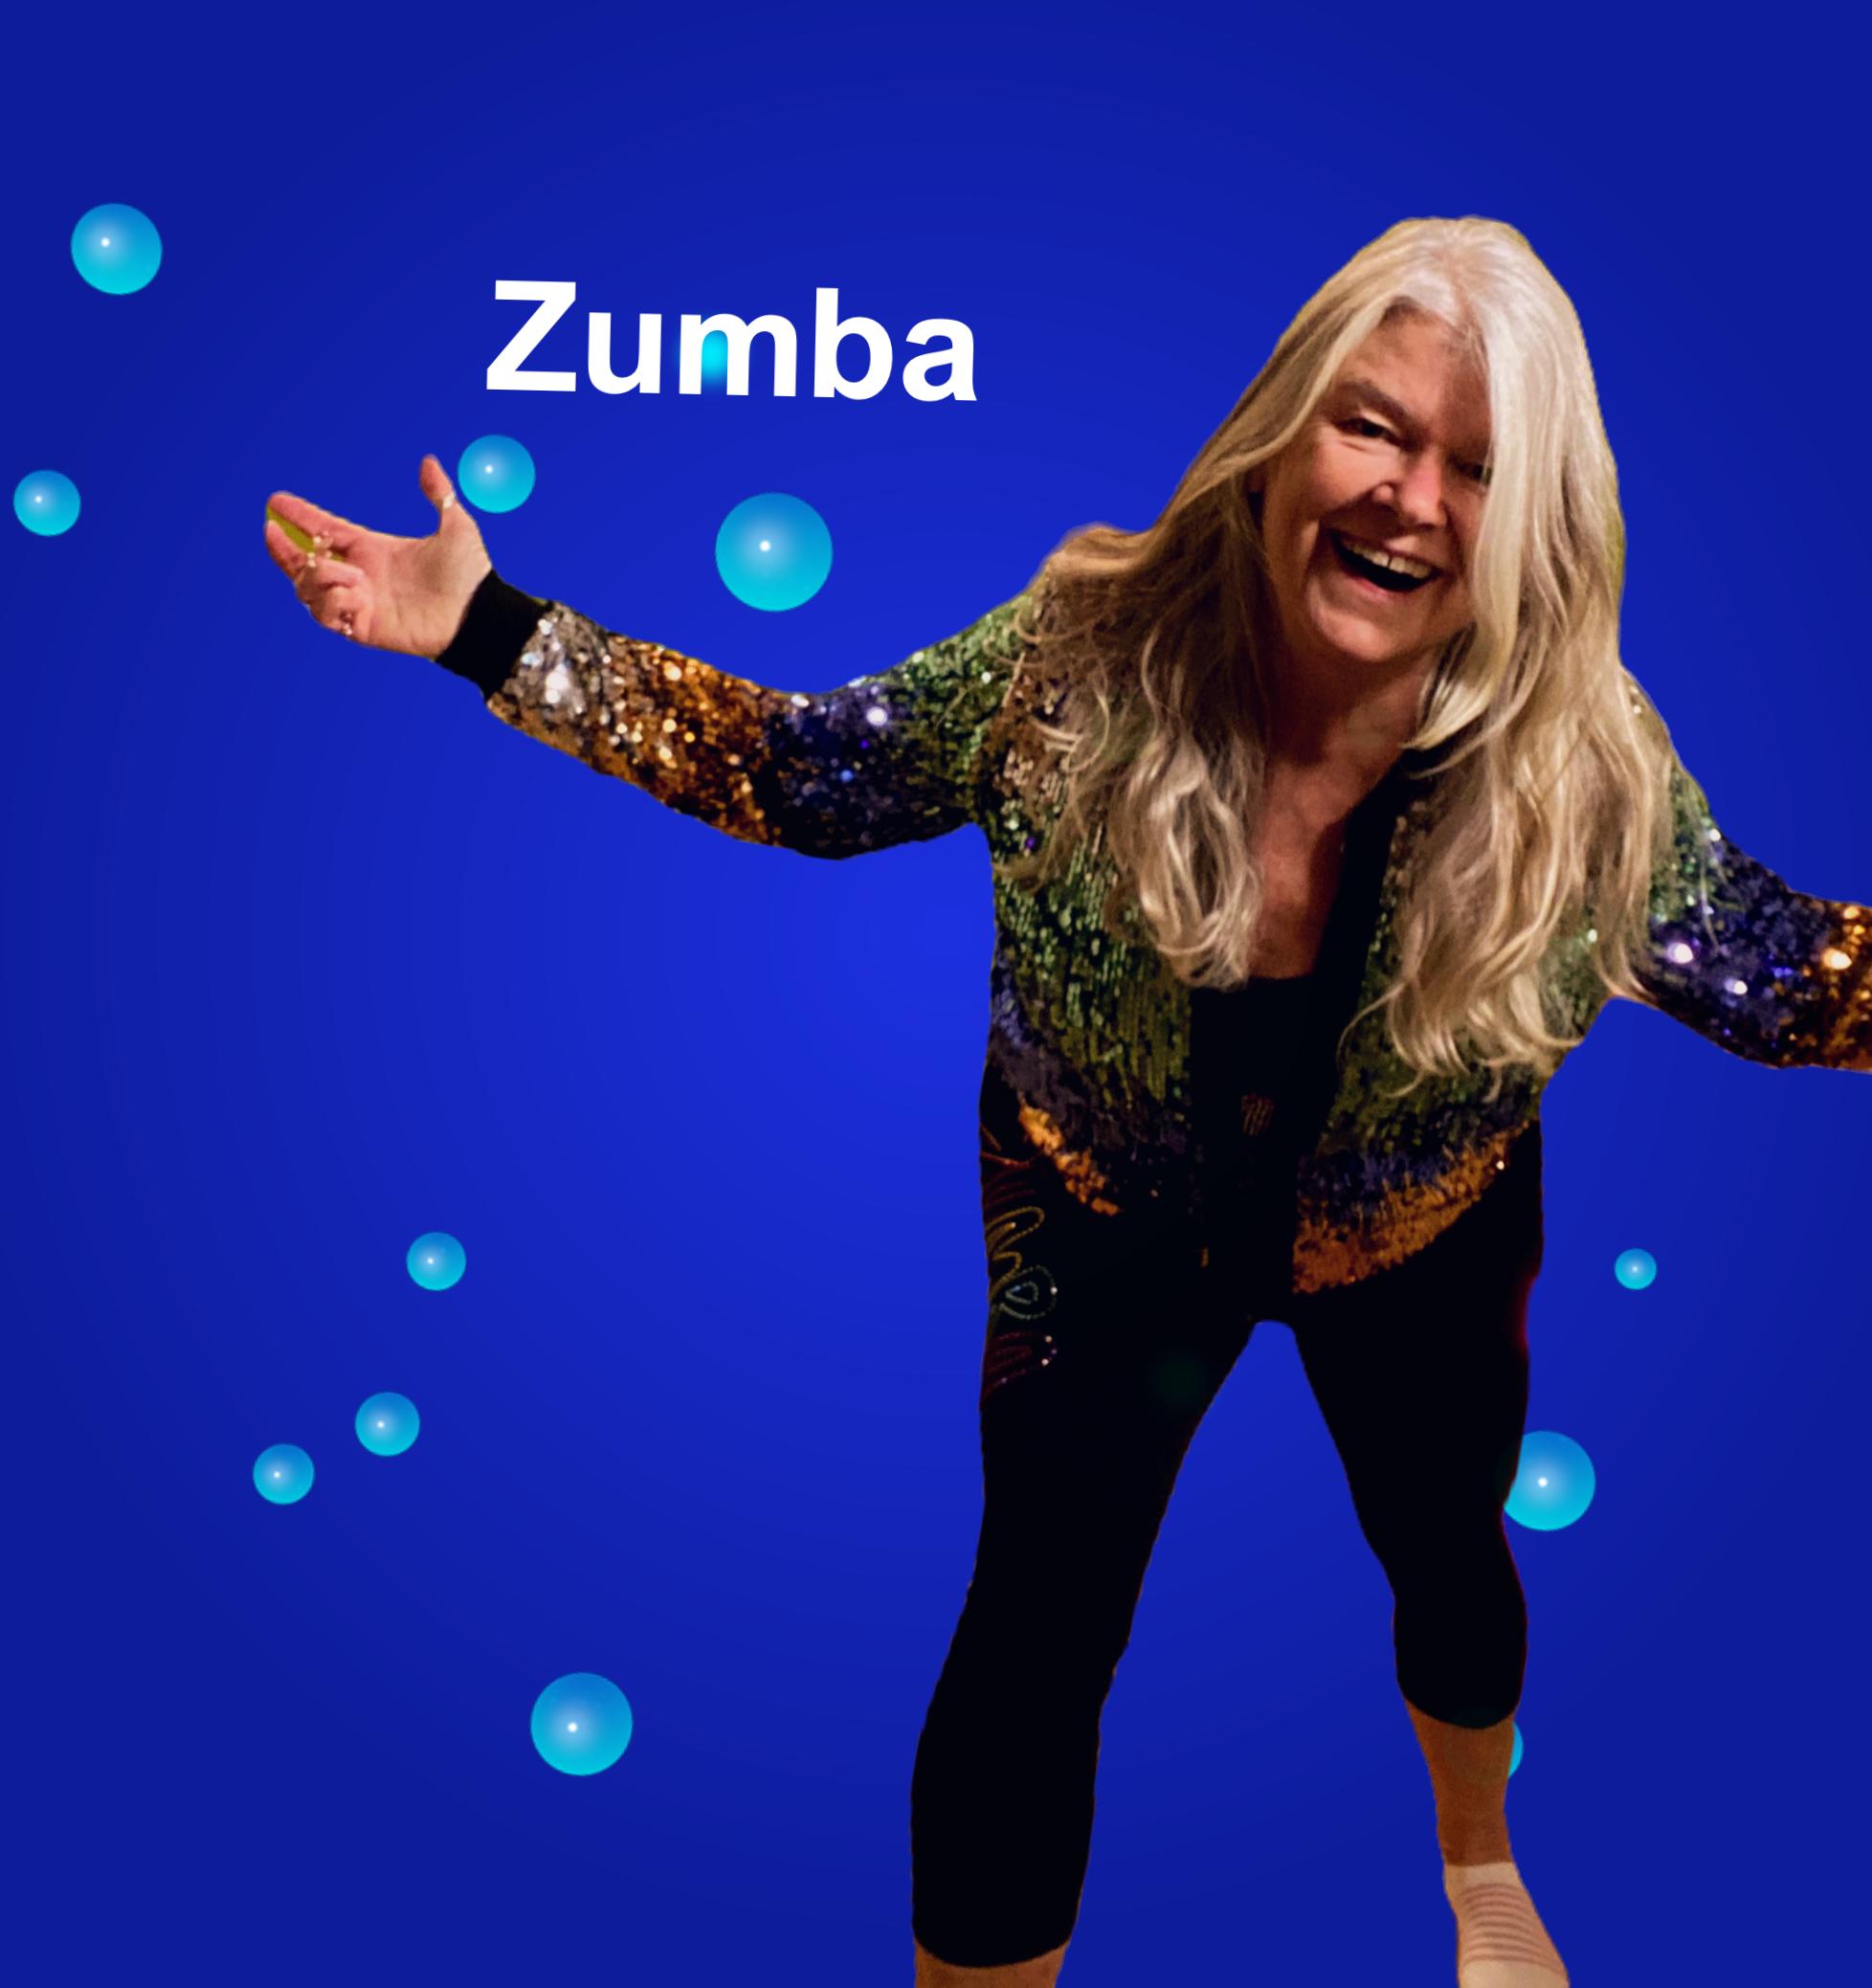 Zumba via Zoom